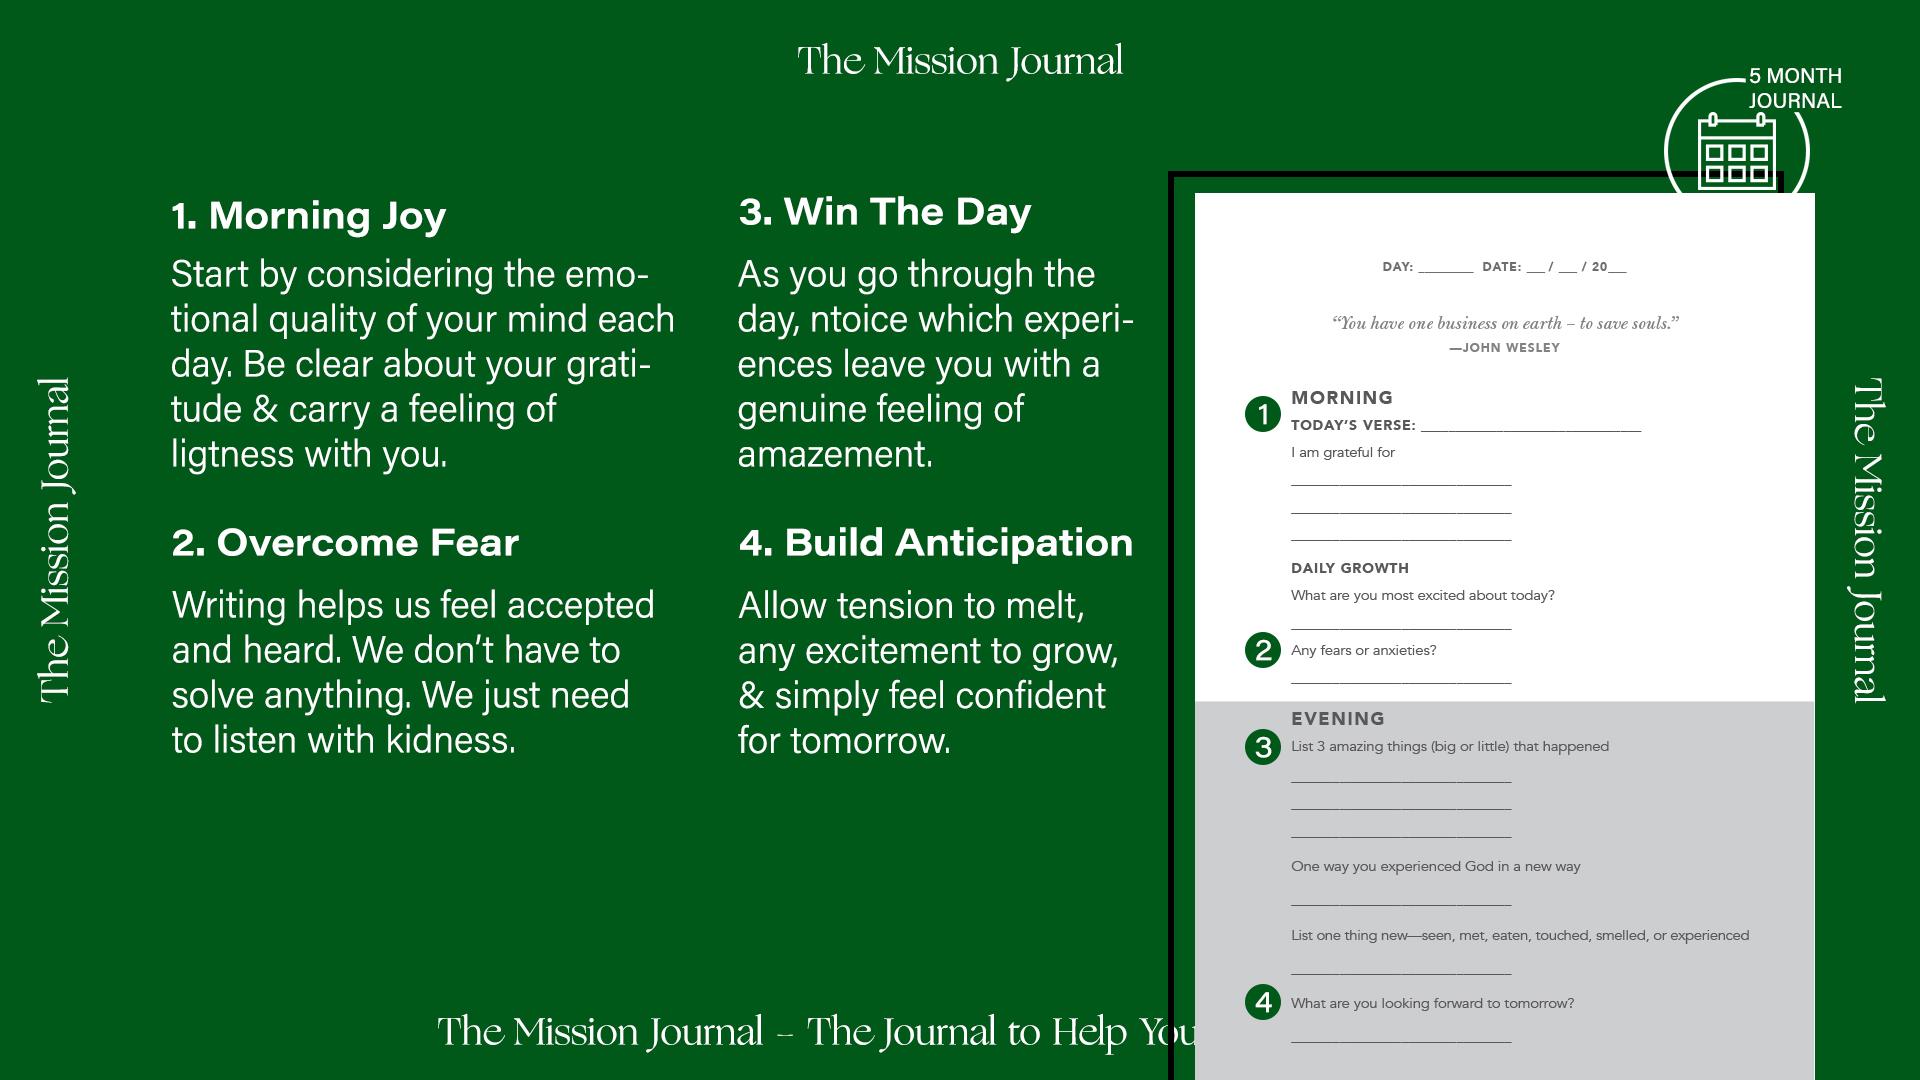 Mission Trip Journal5 Month Short Term Mission Trip Journal.jpg